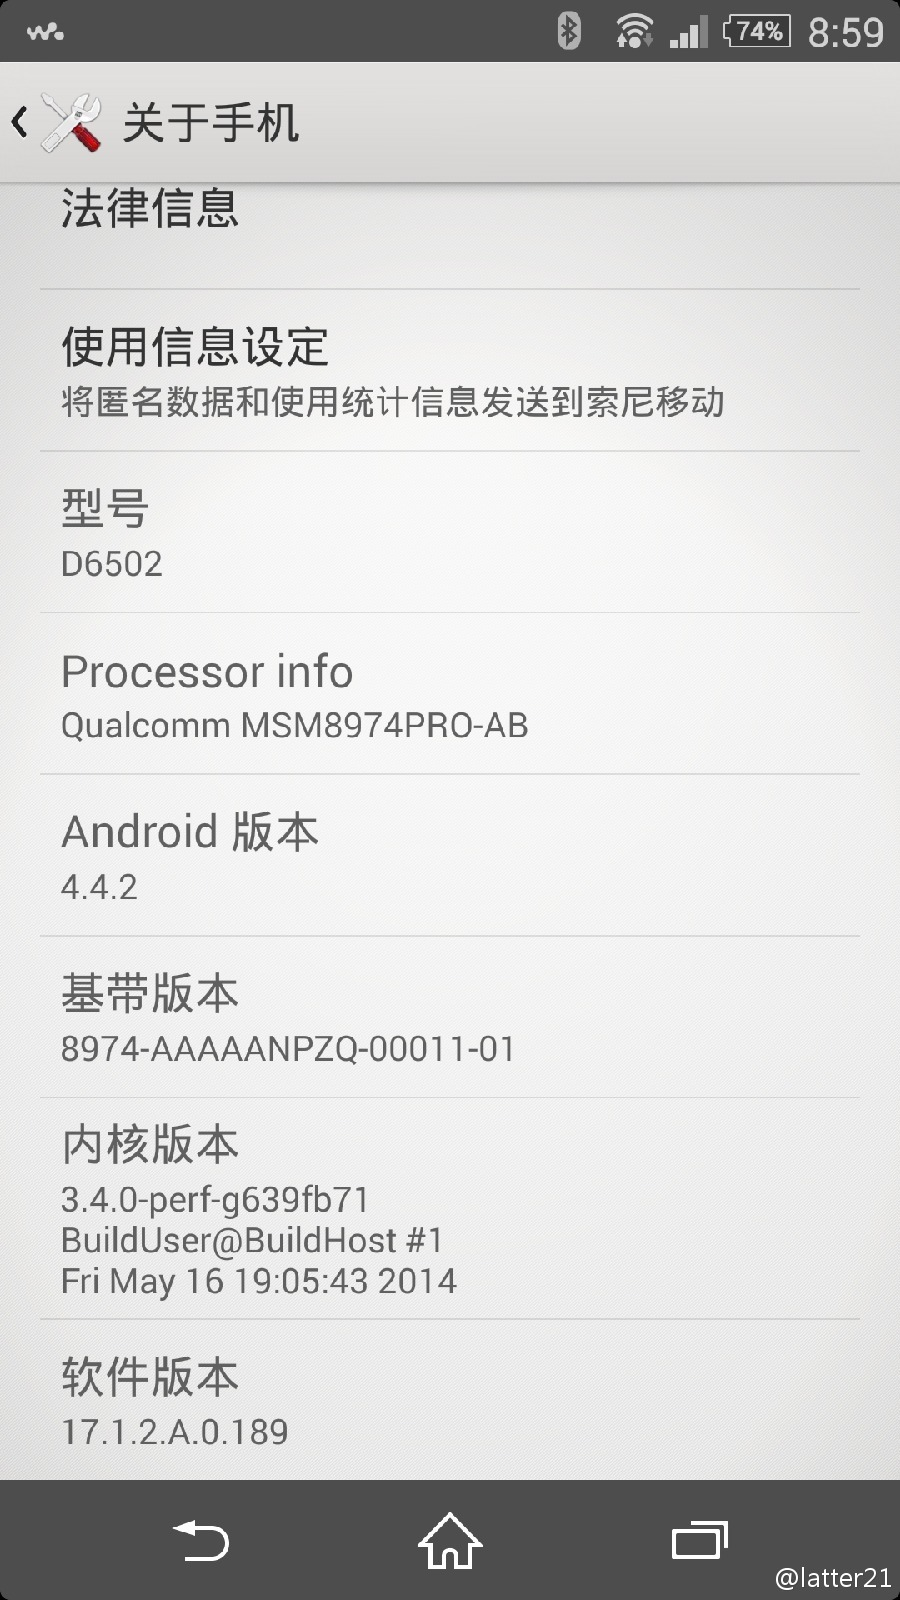 Xperia Z2 17.1.2.A.0.189 firmware screenshot leaked